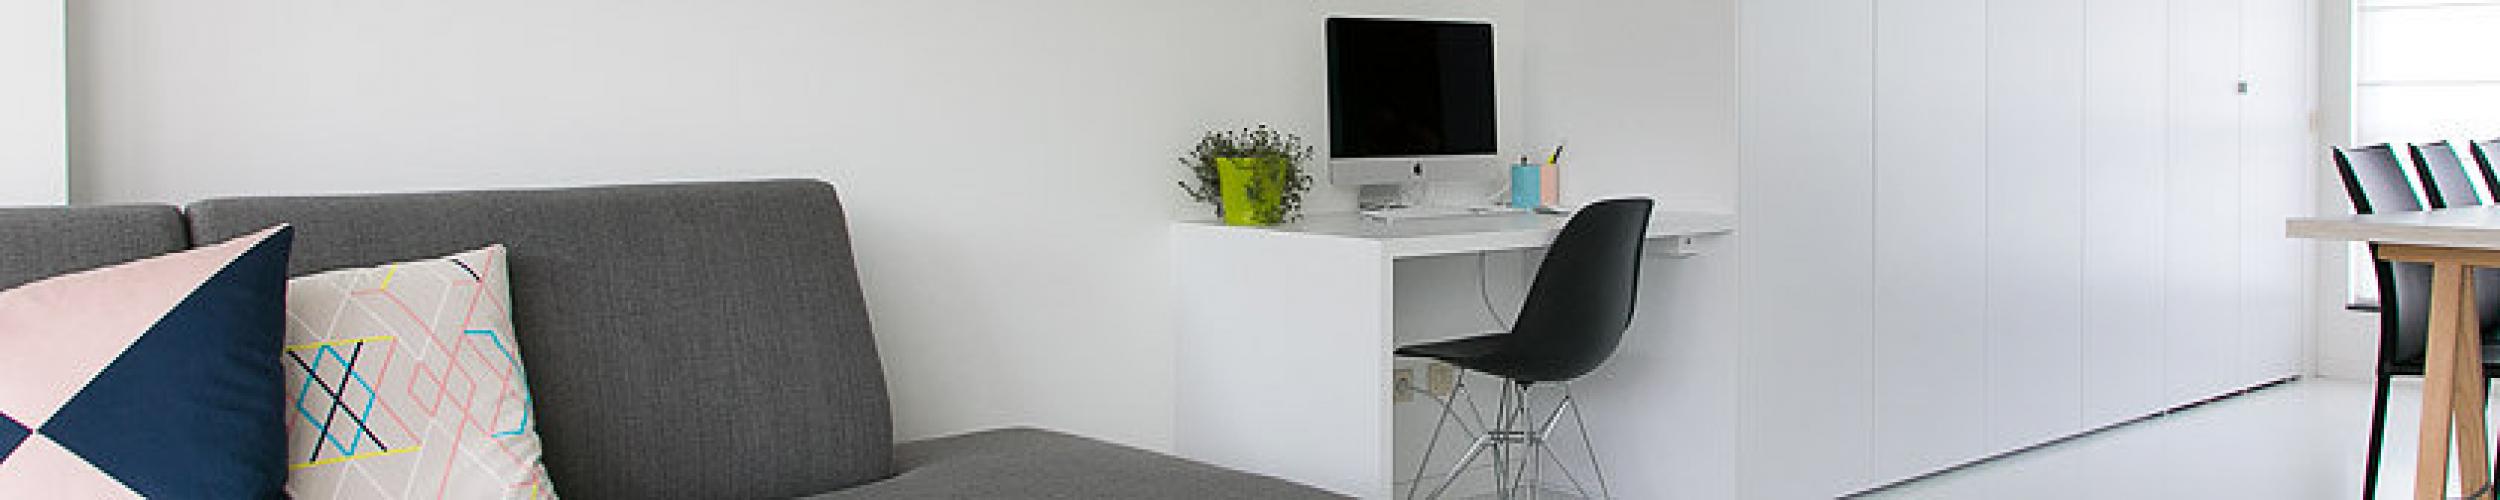 interieurinrichting Sint NIklaas